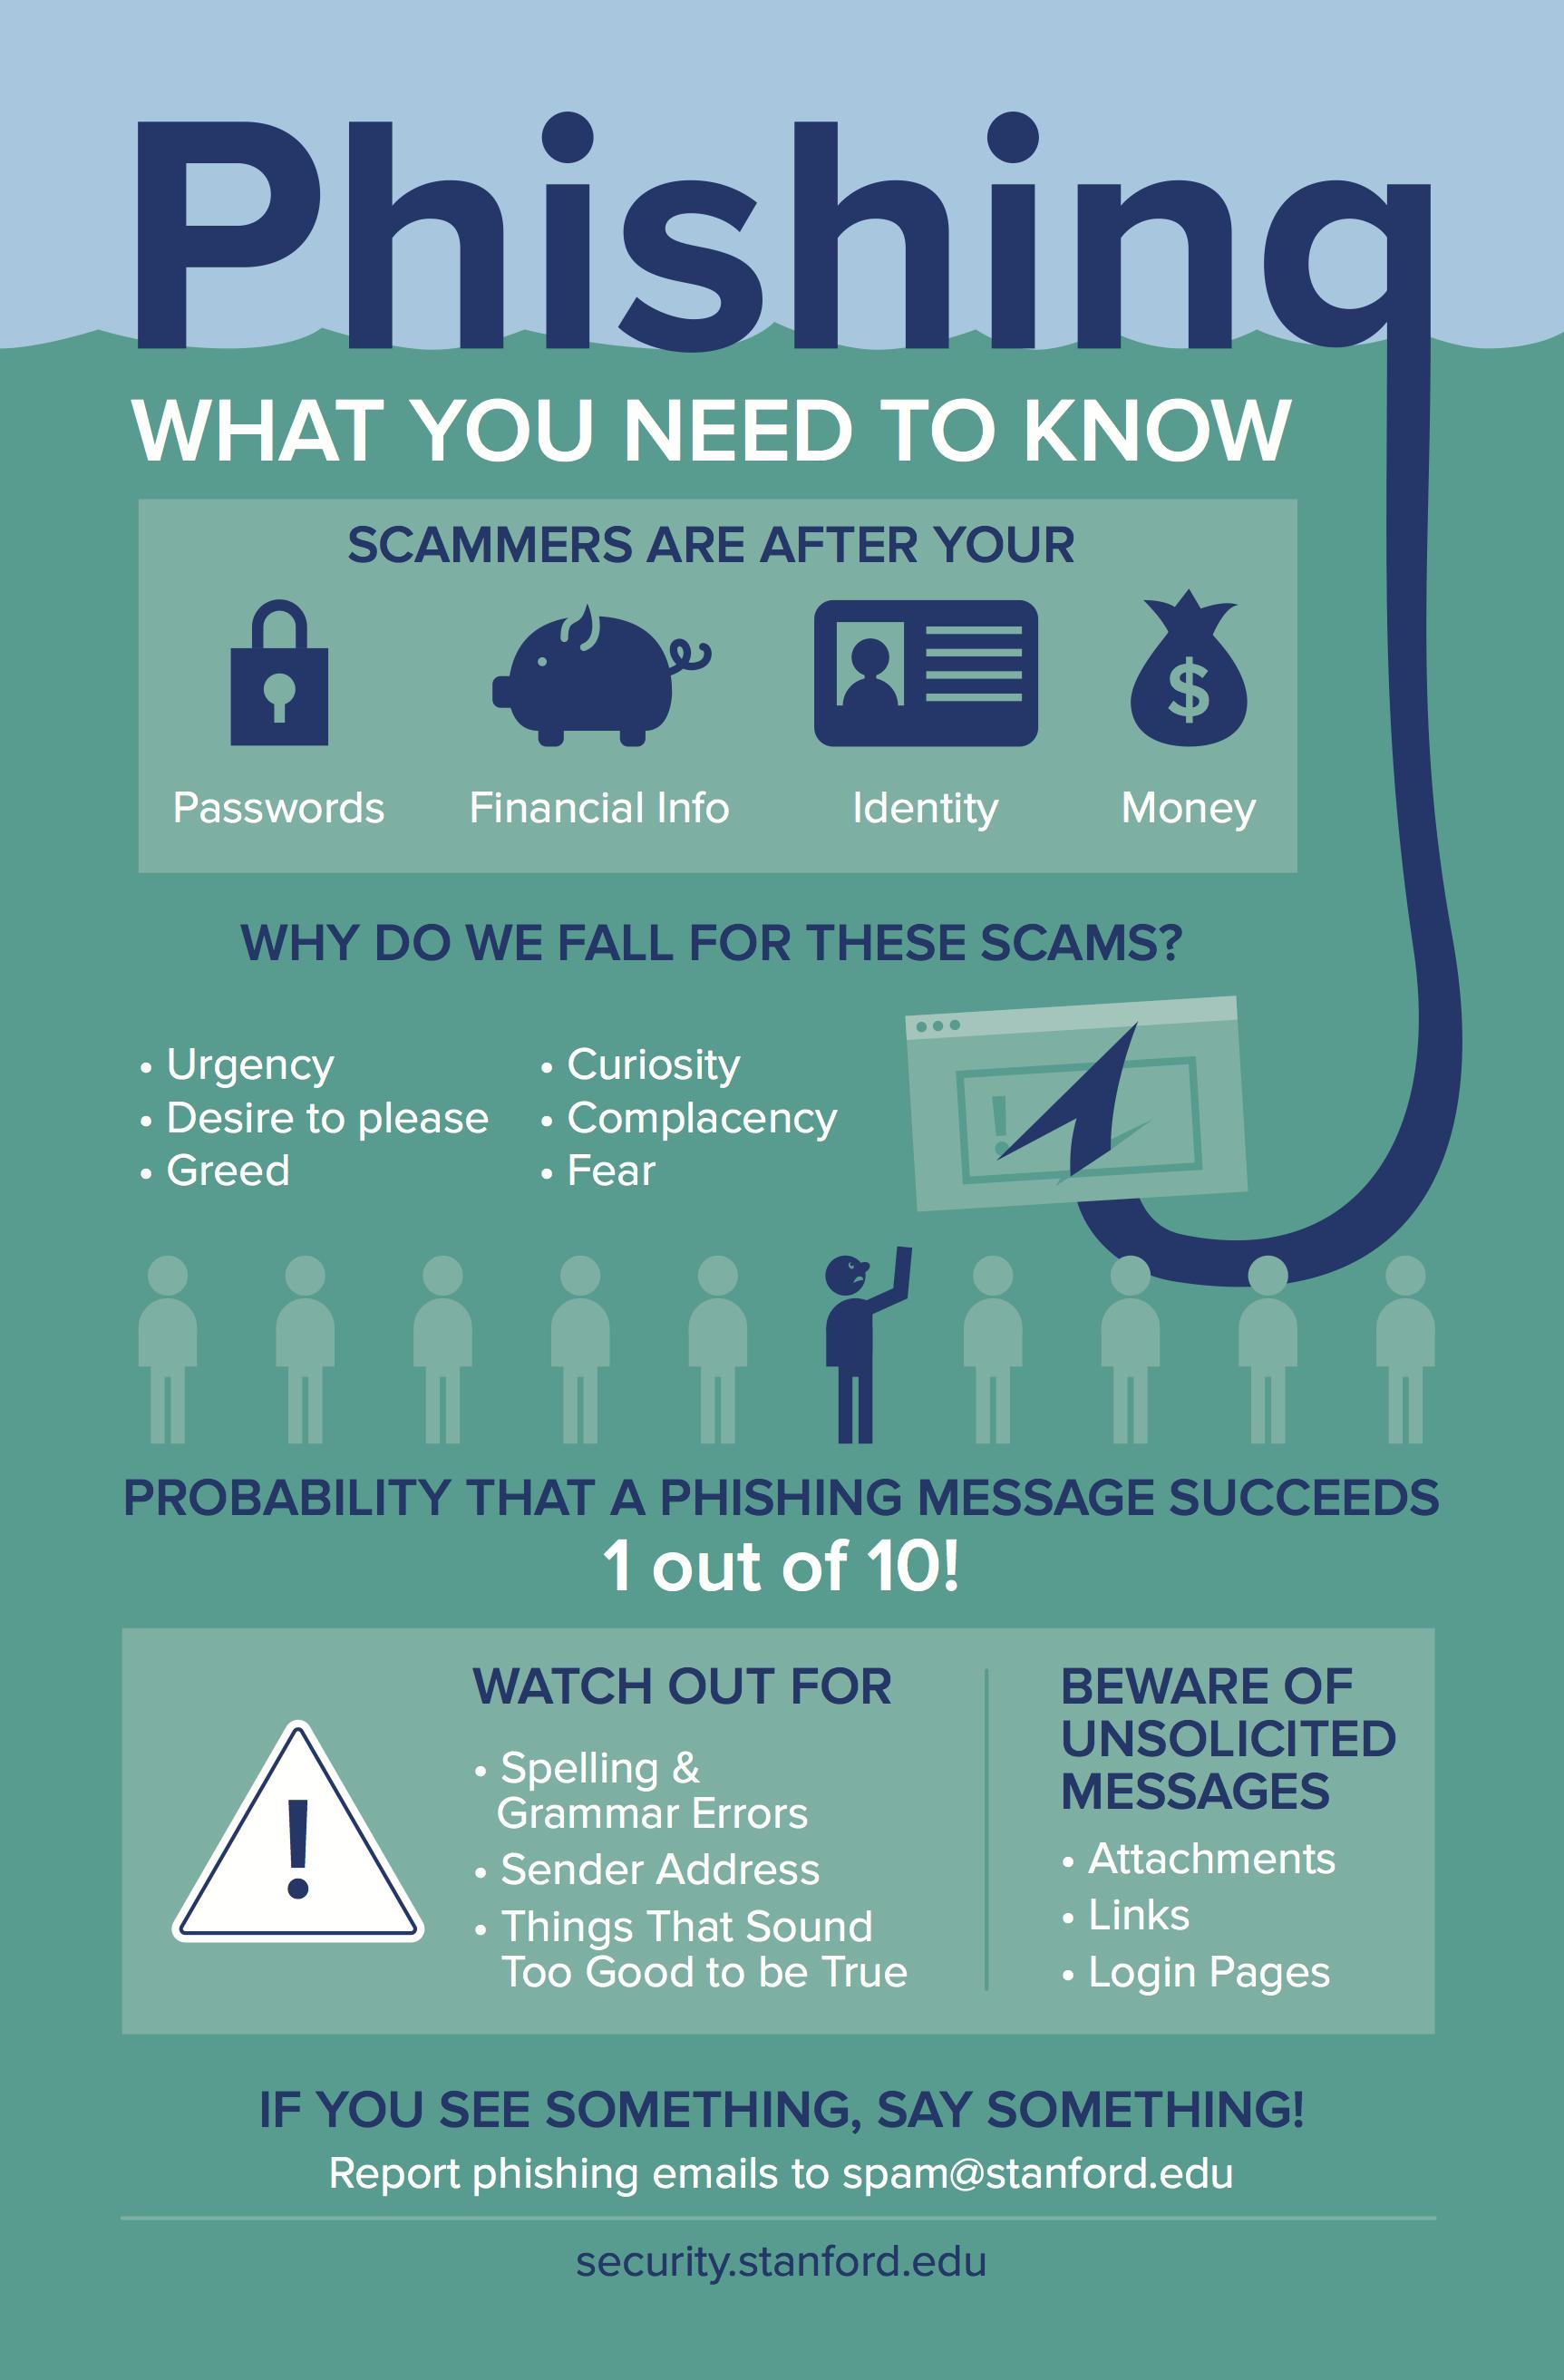 Phishing Fraud Cyber Security · Free image on Pixabay